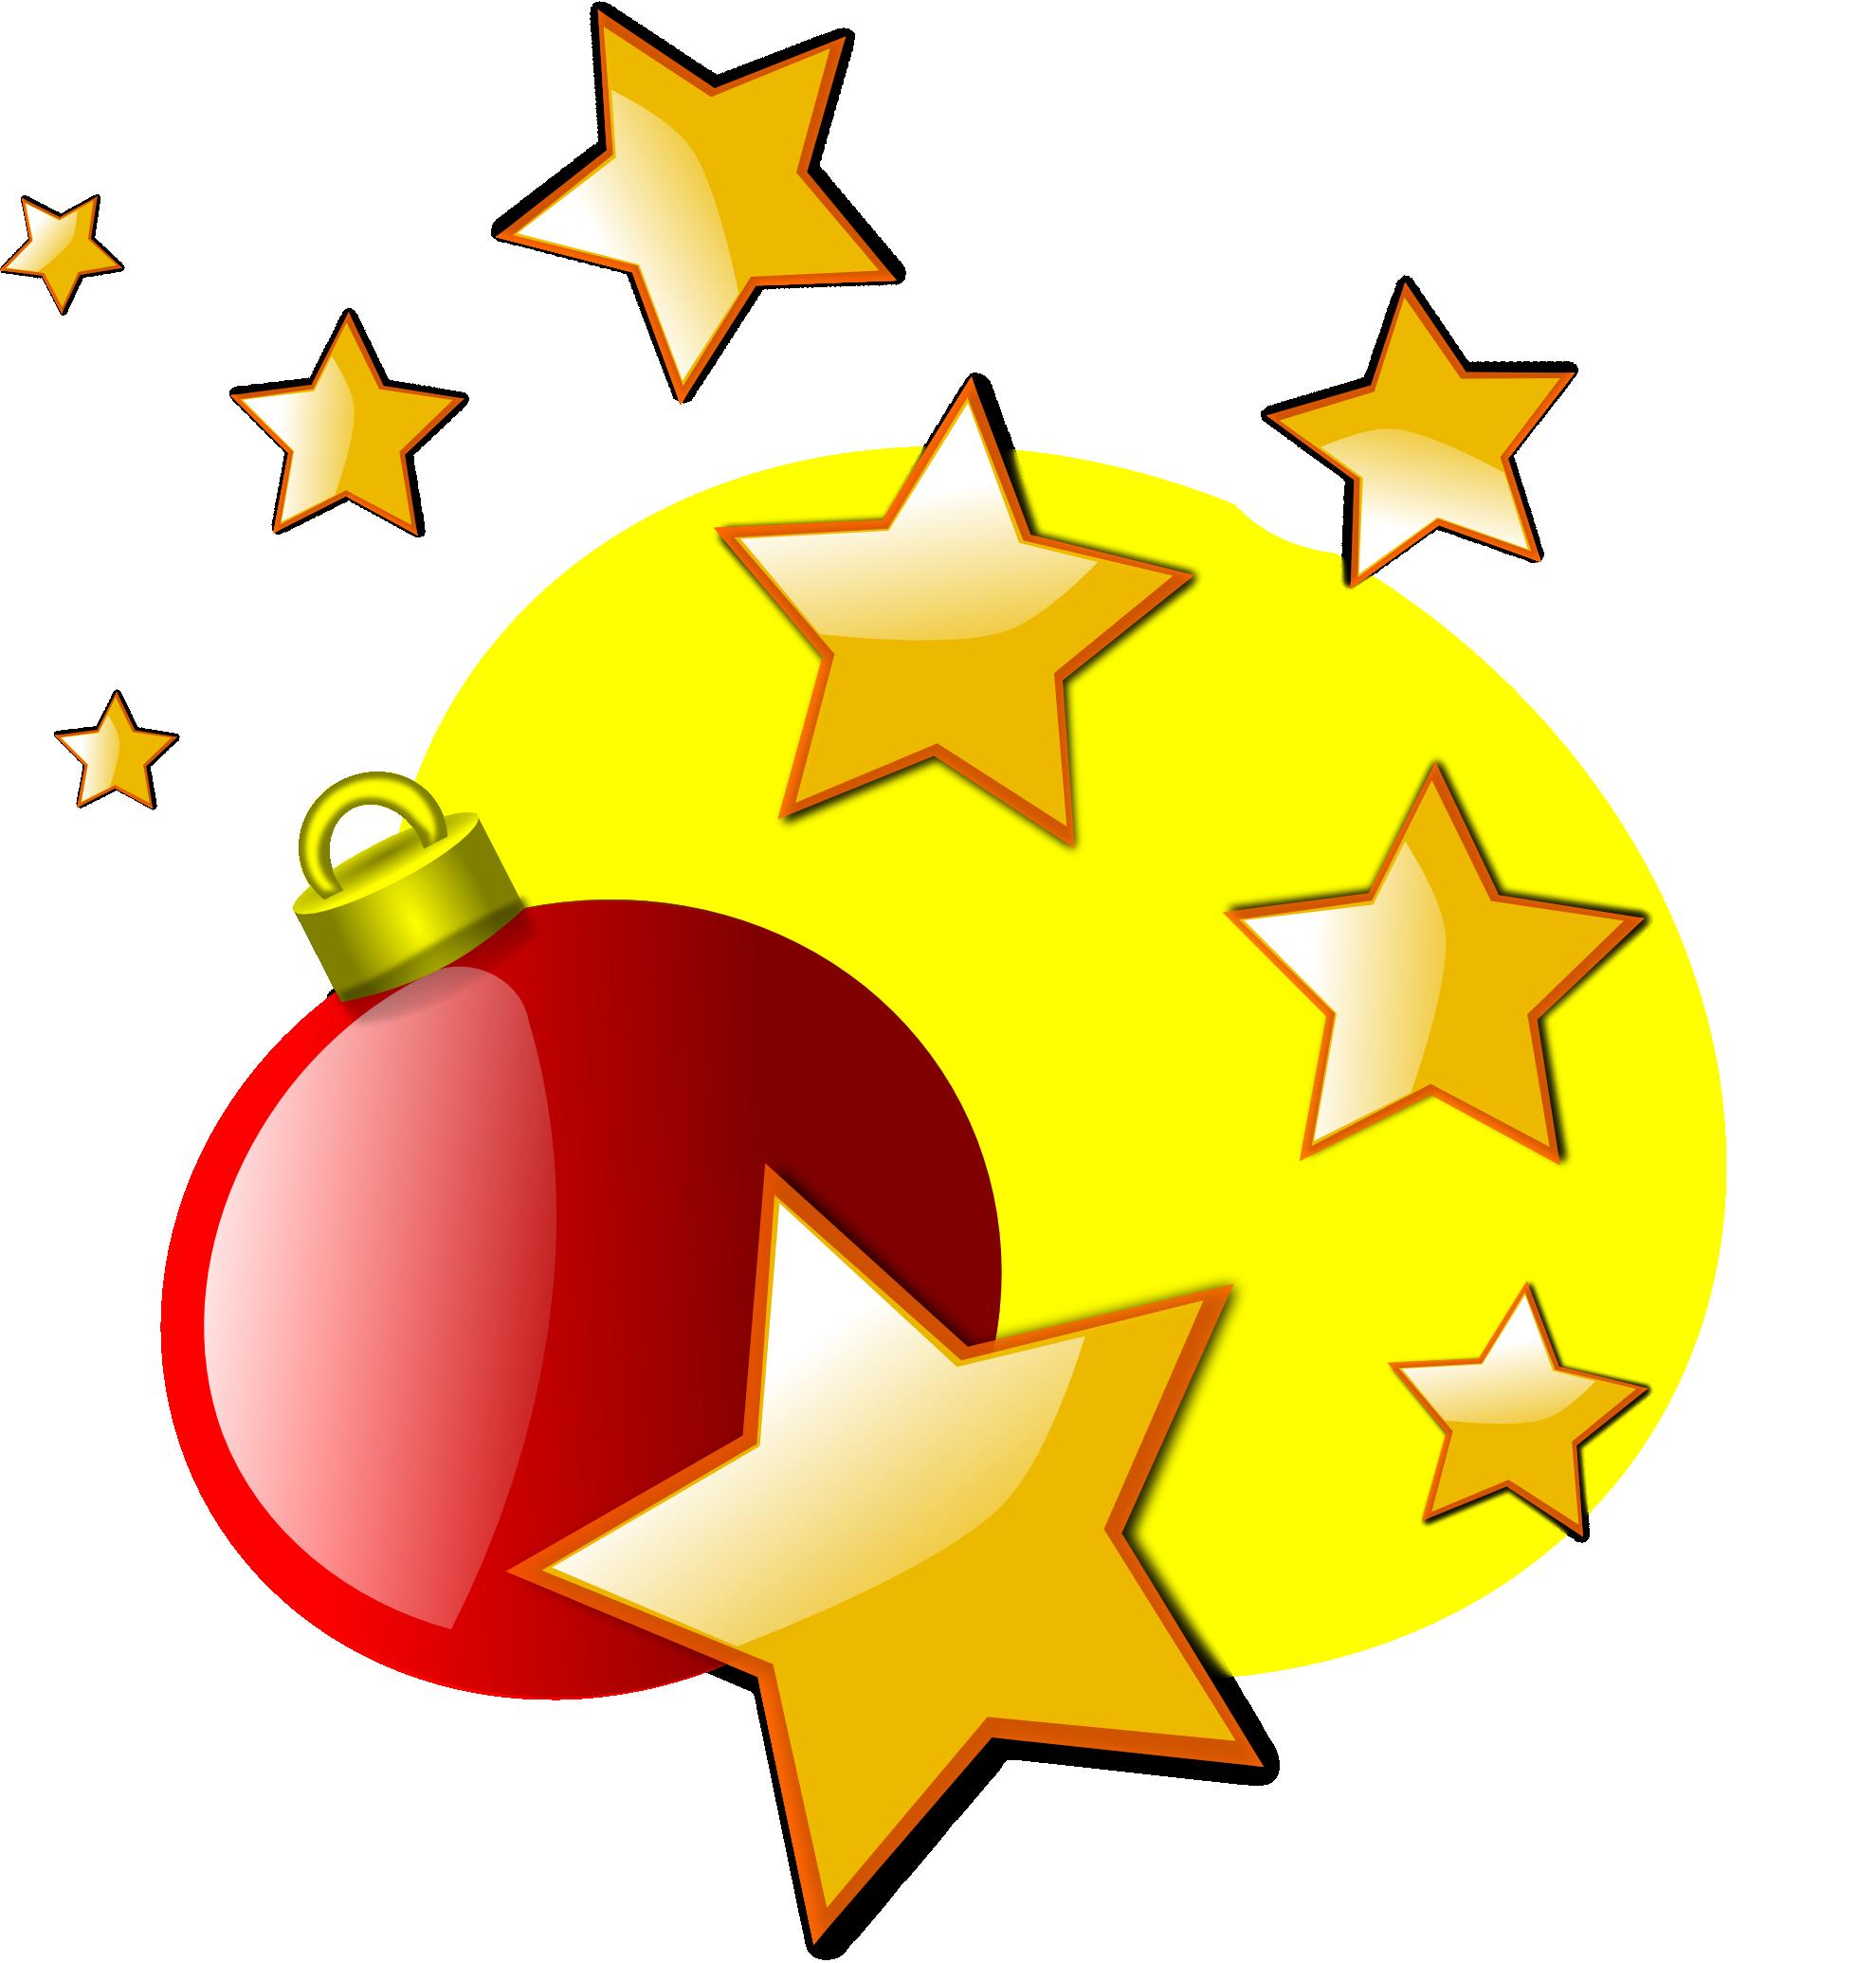 Clip Art Holiday Clipart Clipartbold 2-Clip art holiday clipart clipartbold 2-14